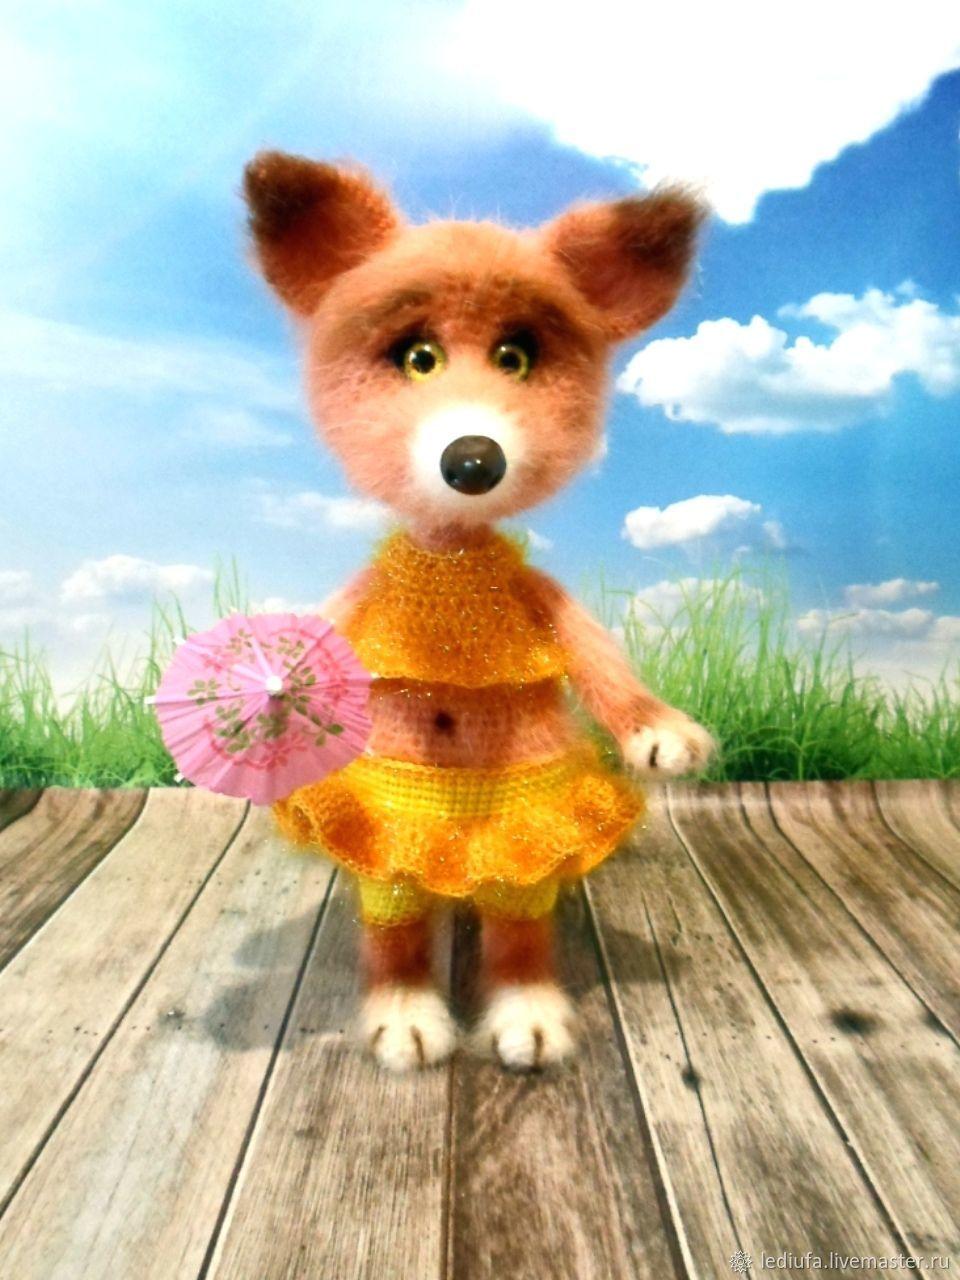 Fox Alisa2, Stuffed Toys, Ufa,  Фото №1